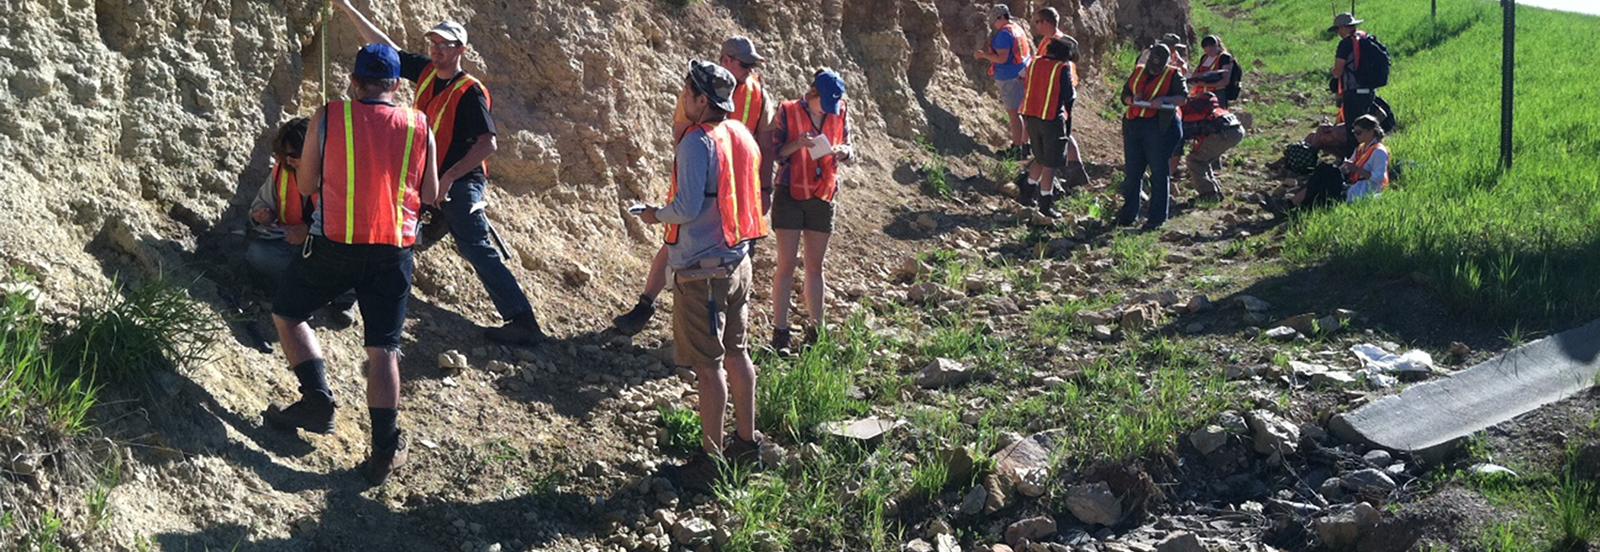 ESCI 4622, Geology Field Camp, students measuring and describing rocks at Deadwood, South Dakota.